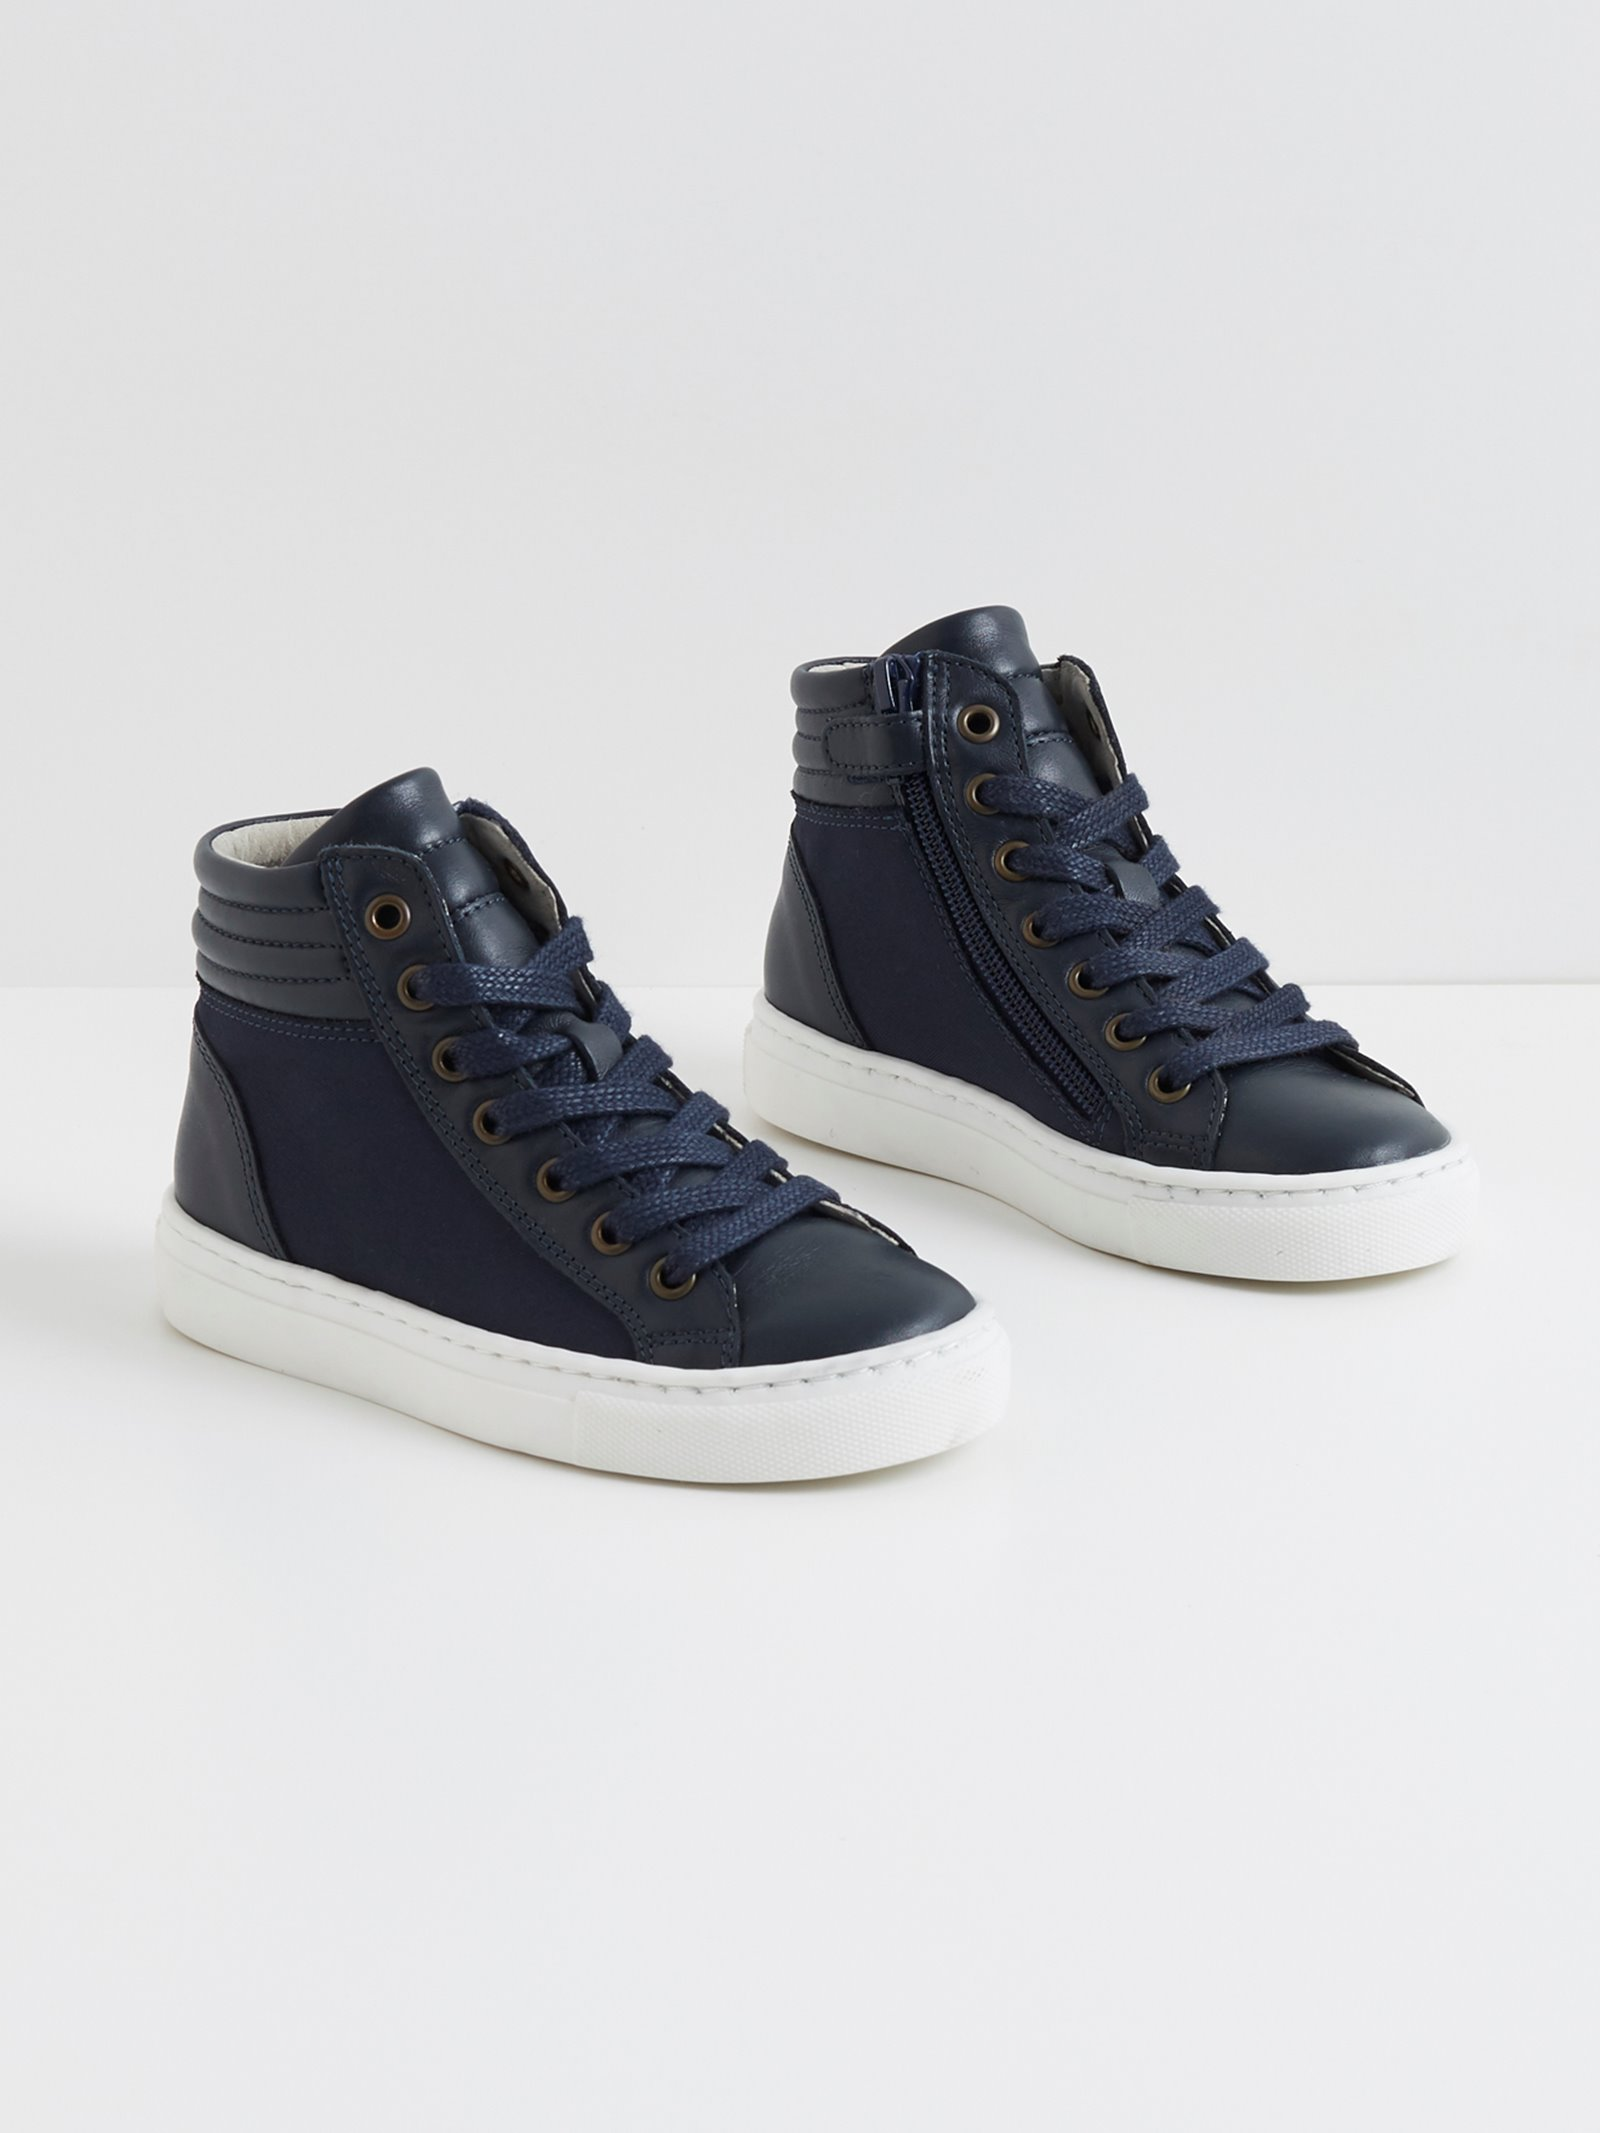 Chaussure de ville synonyme